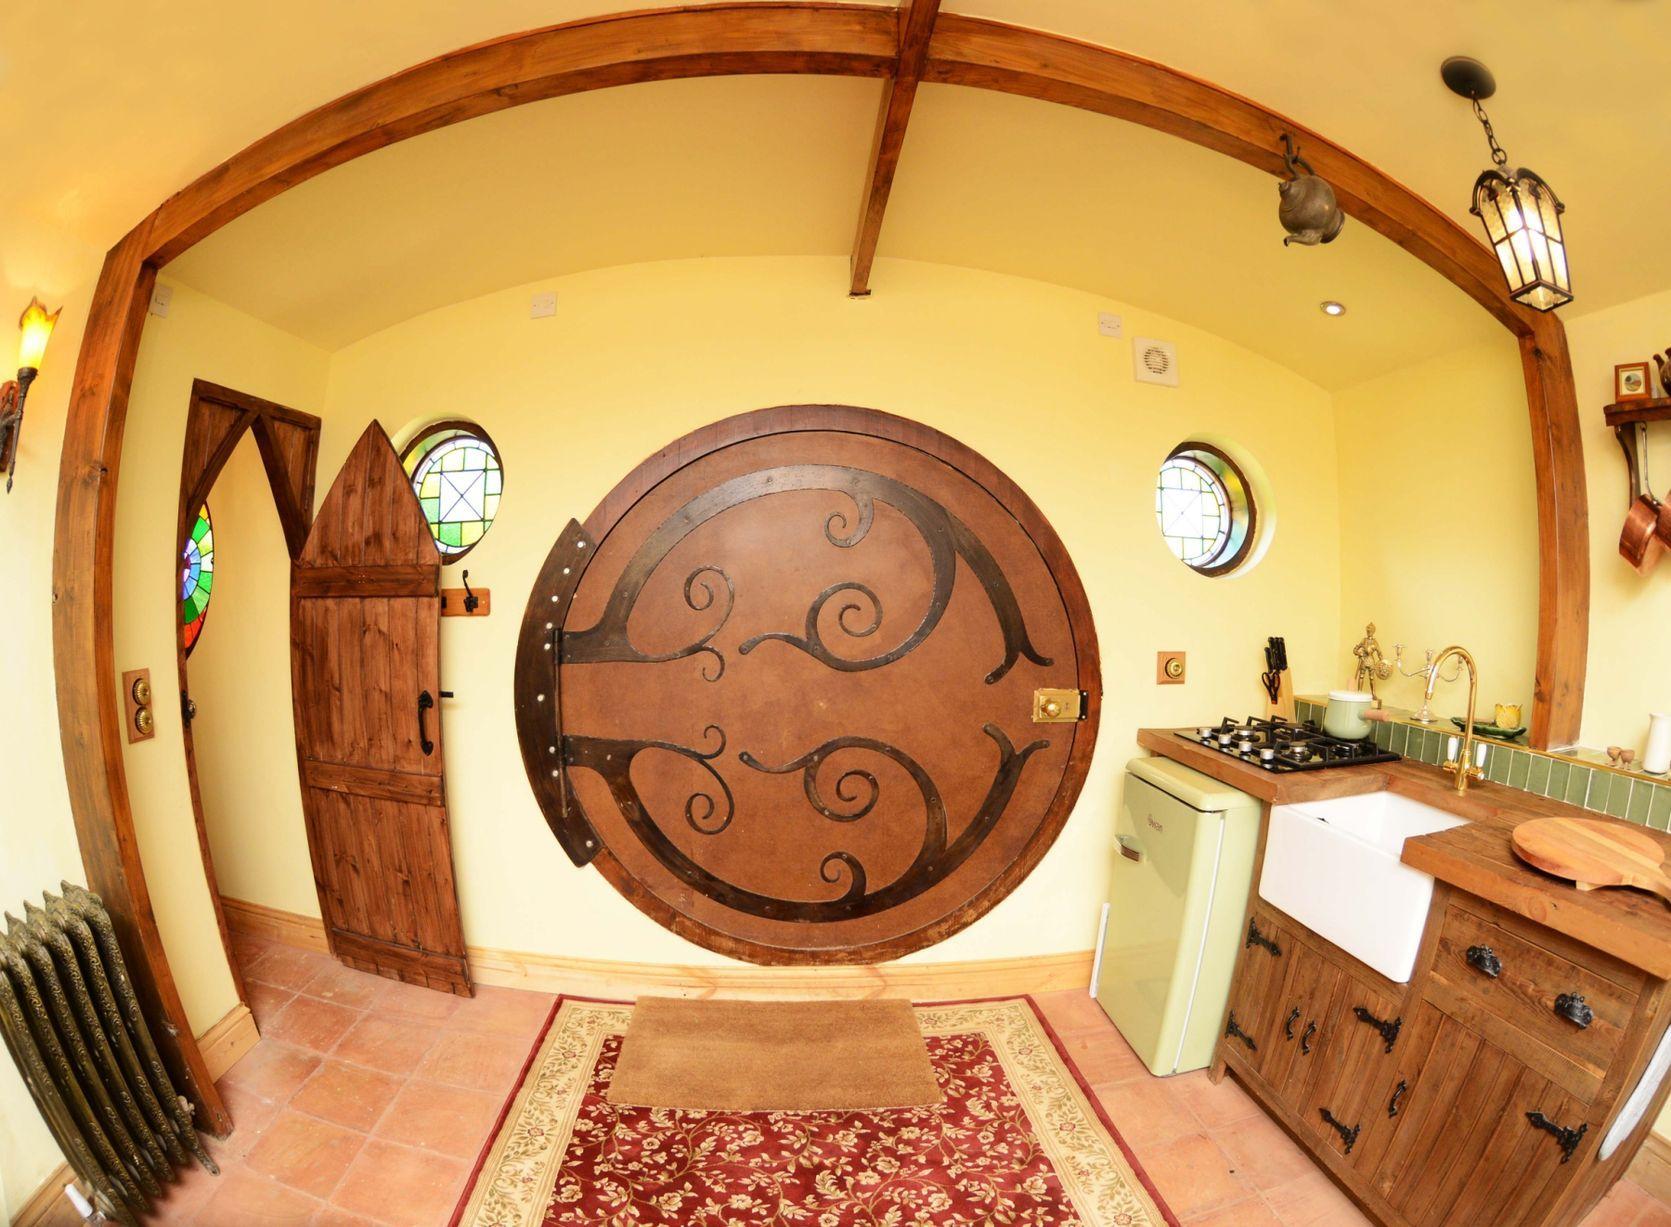 Hobbit house interior, Yorkshire